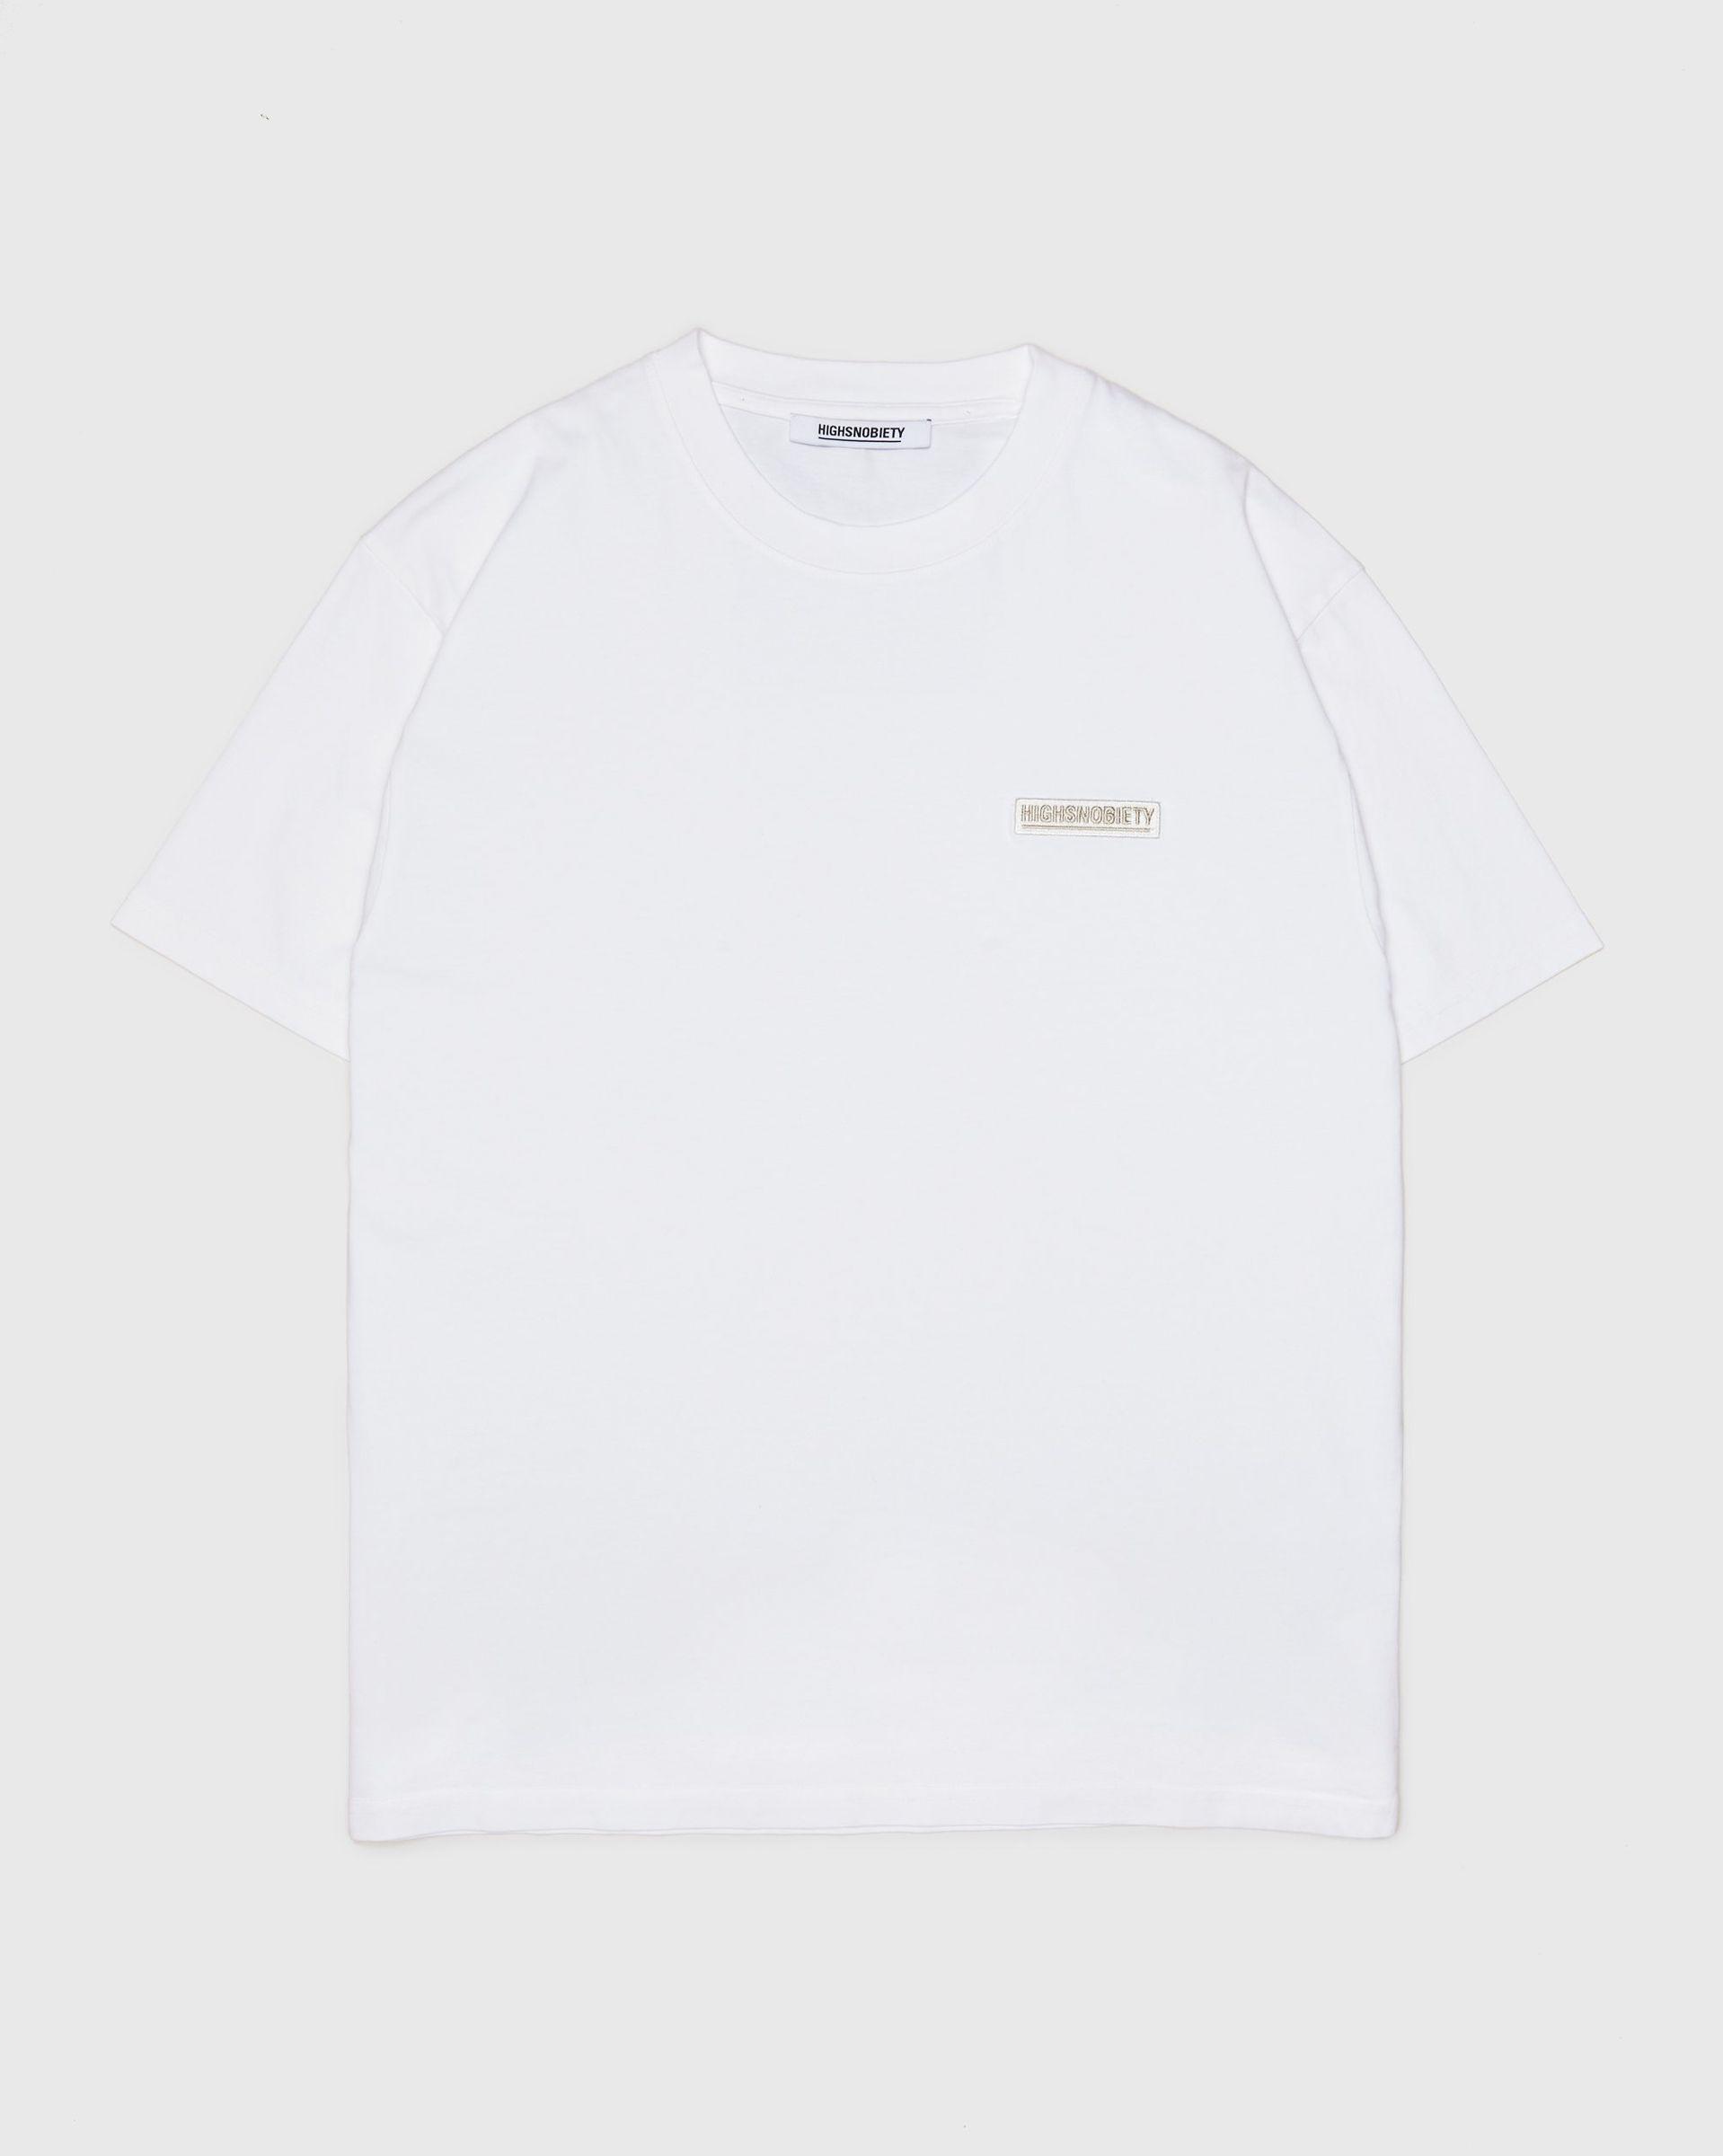 Highsnobiety Staples - T-Shirt White - Image 1